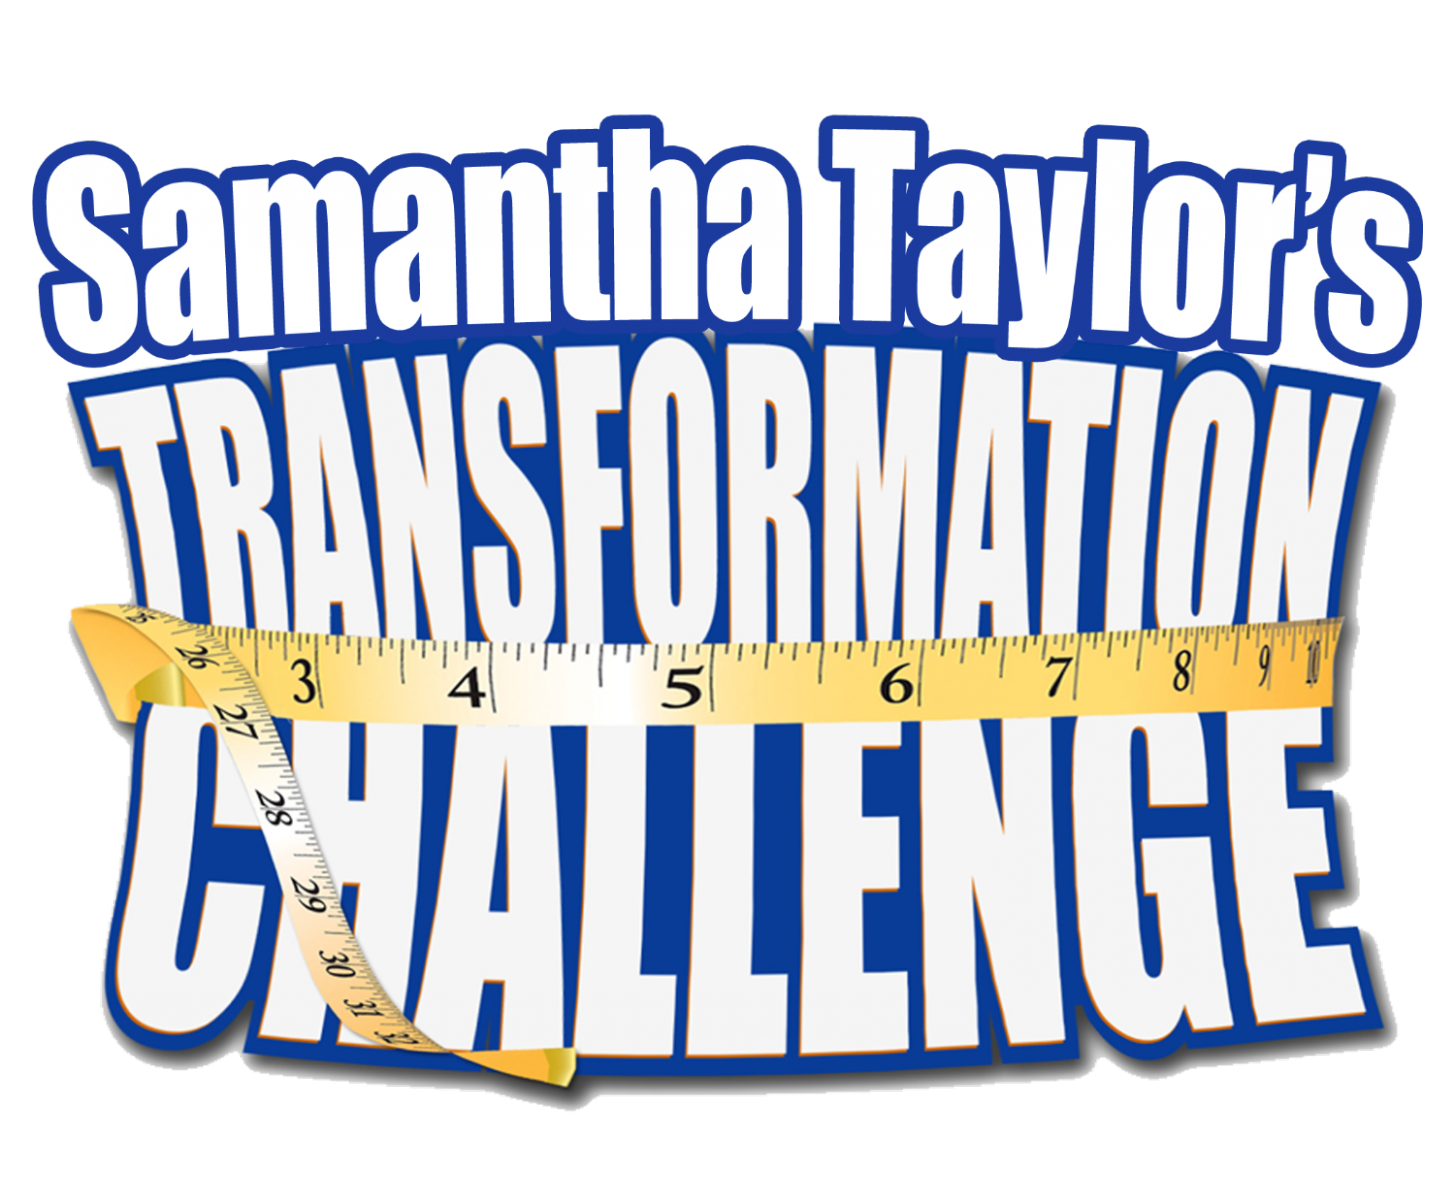 tampa conference Transformation florida domination